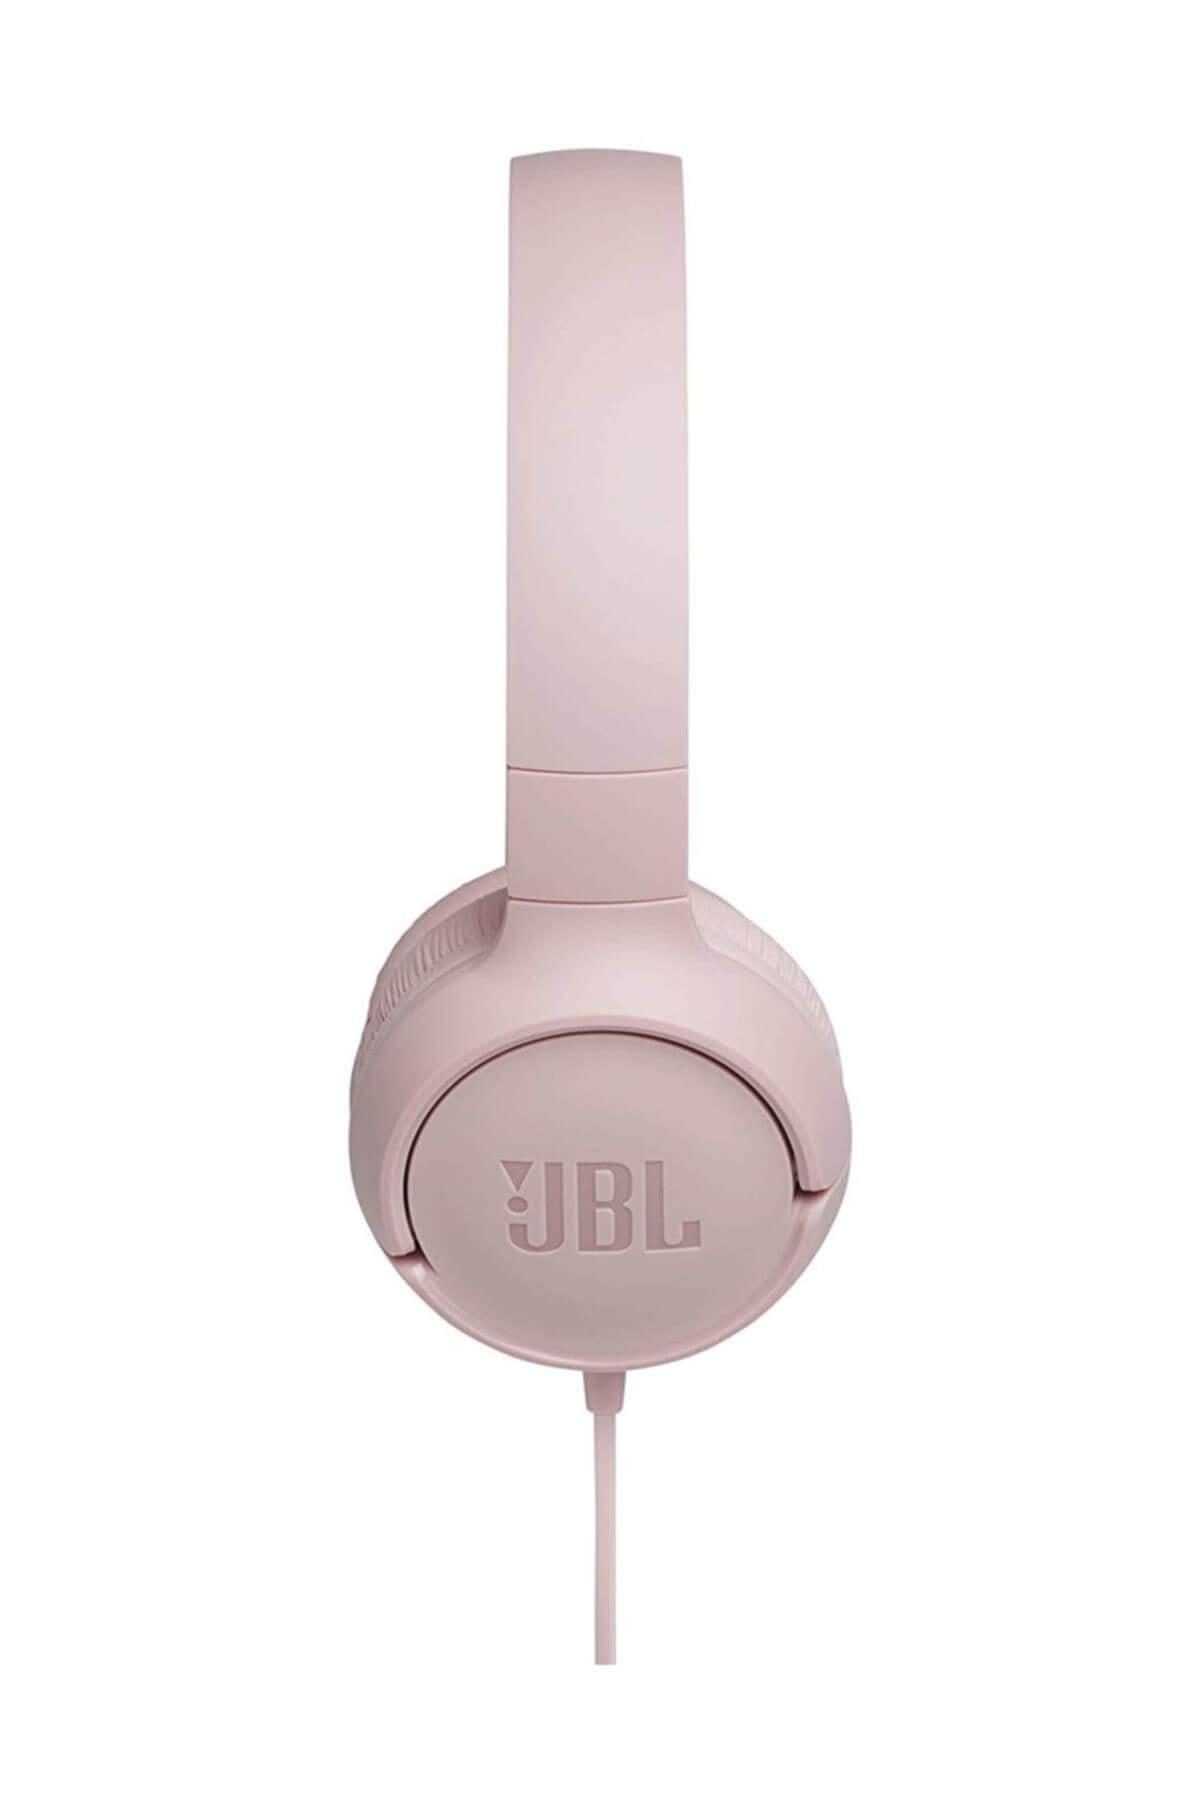 Tune 500 Pembe Kablolu Kulak Üstü Kulaklık